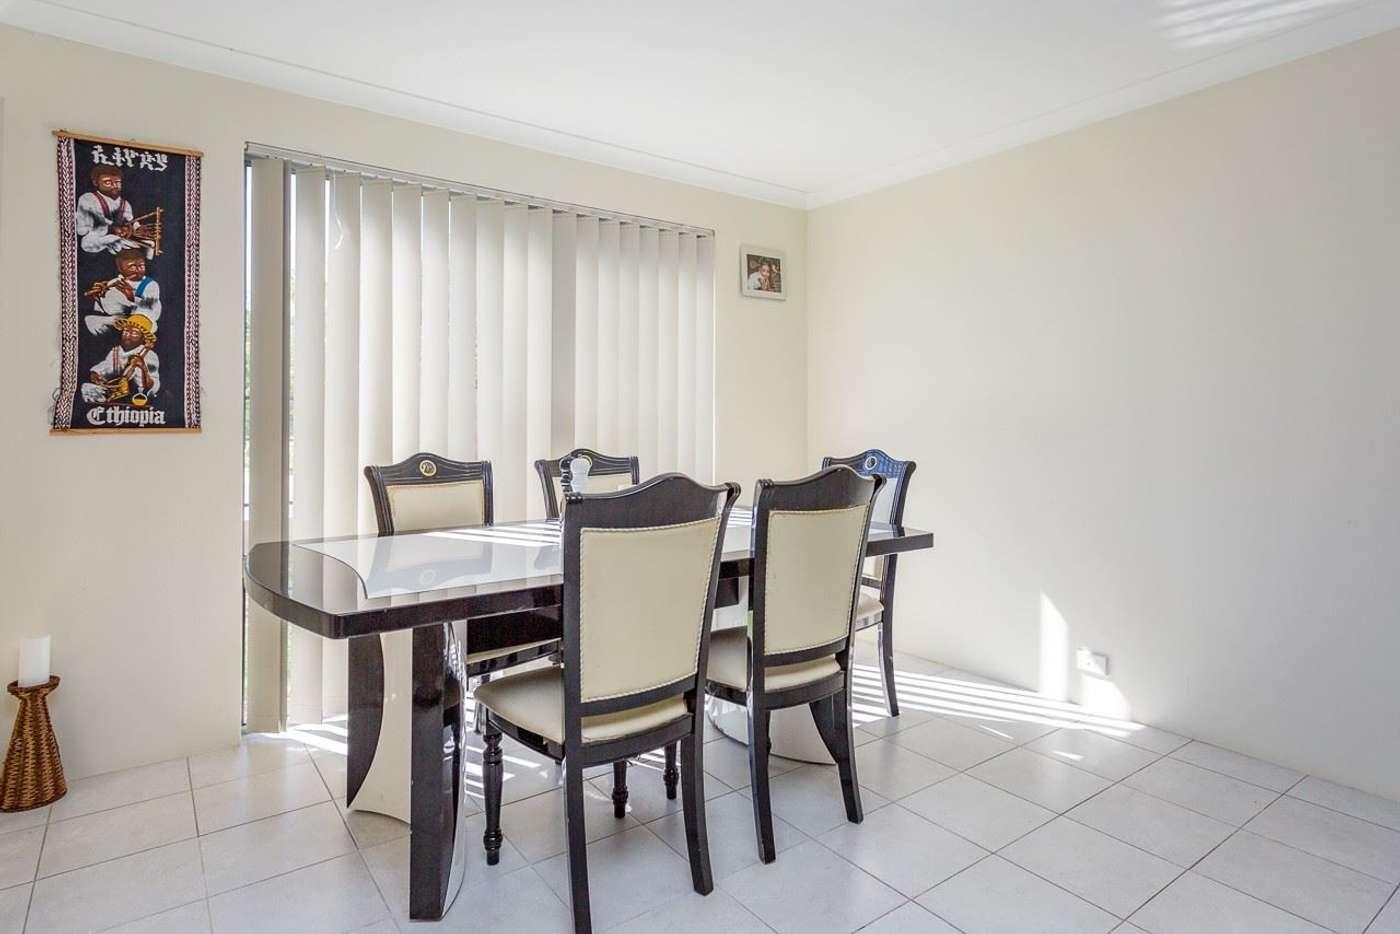 Sixth view of Homely house listing, 36 Panozza Circle, Maddington WA 6109